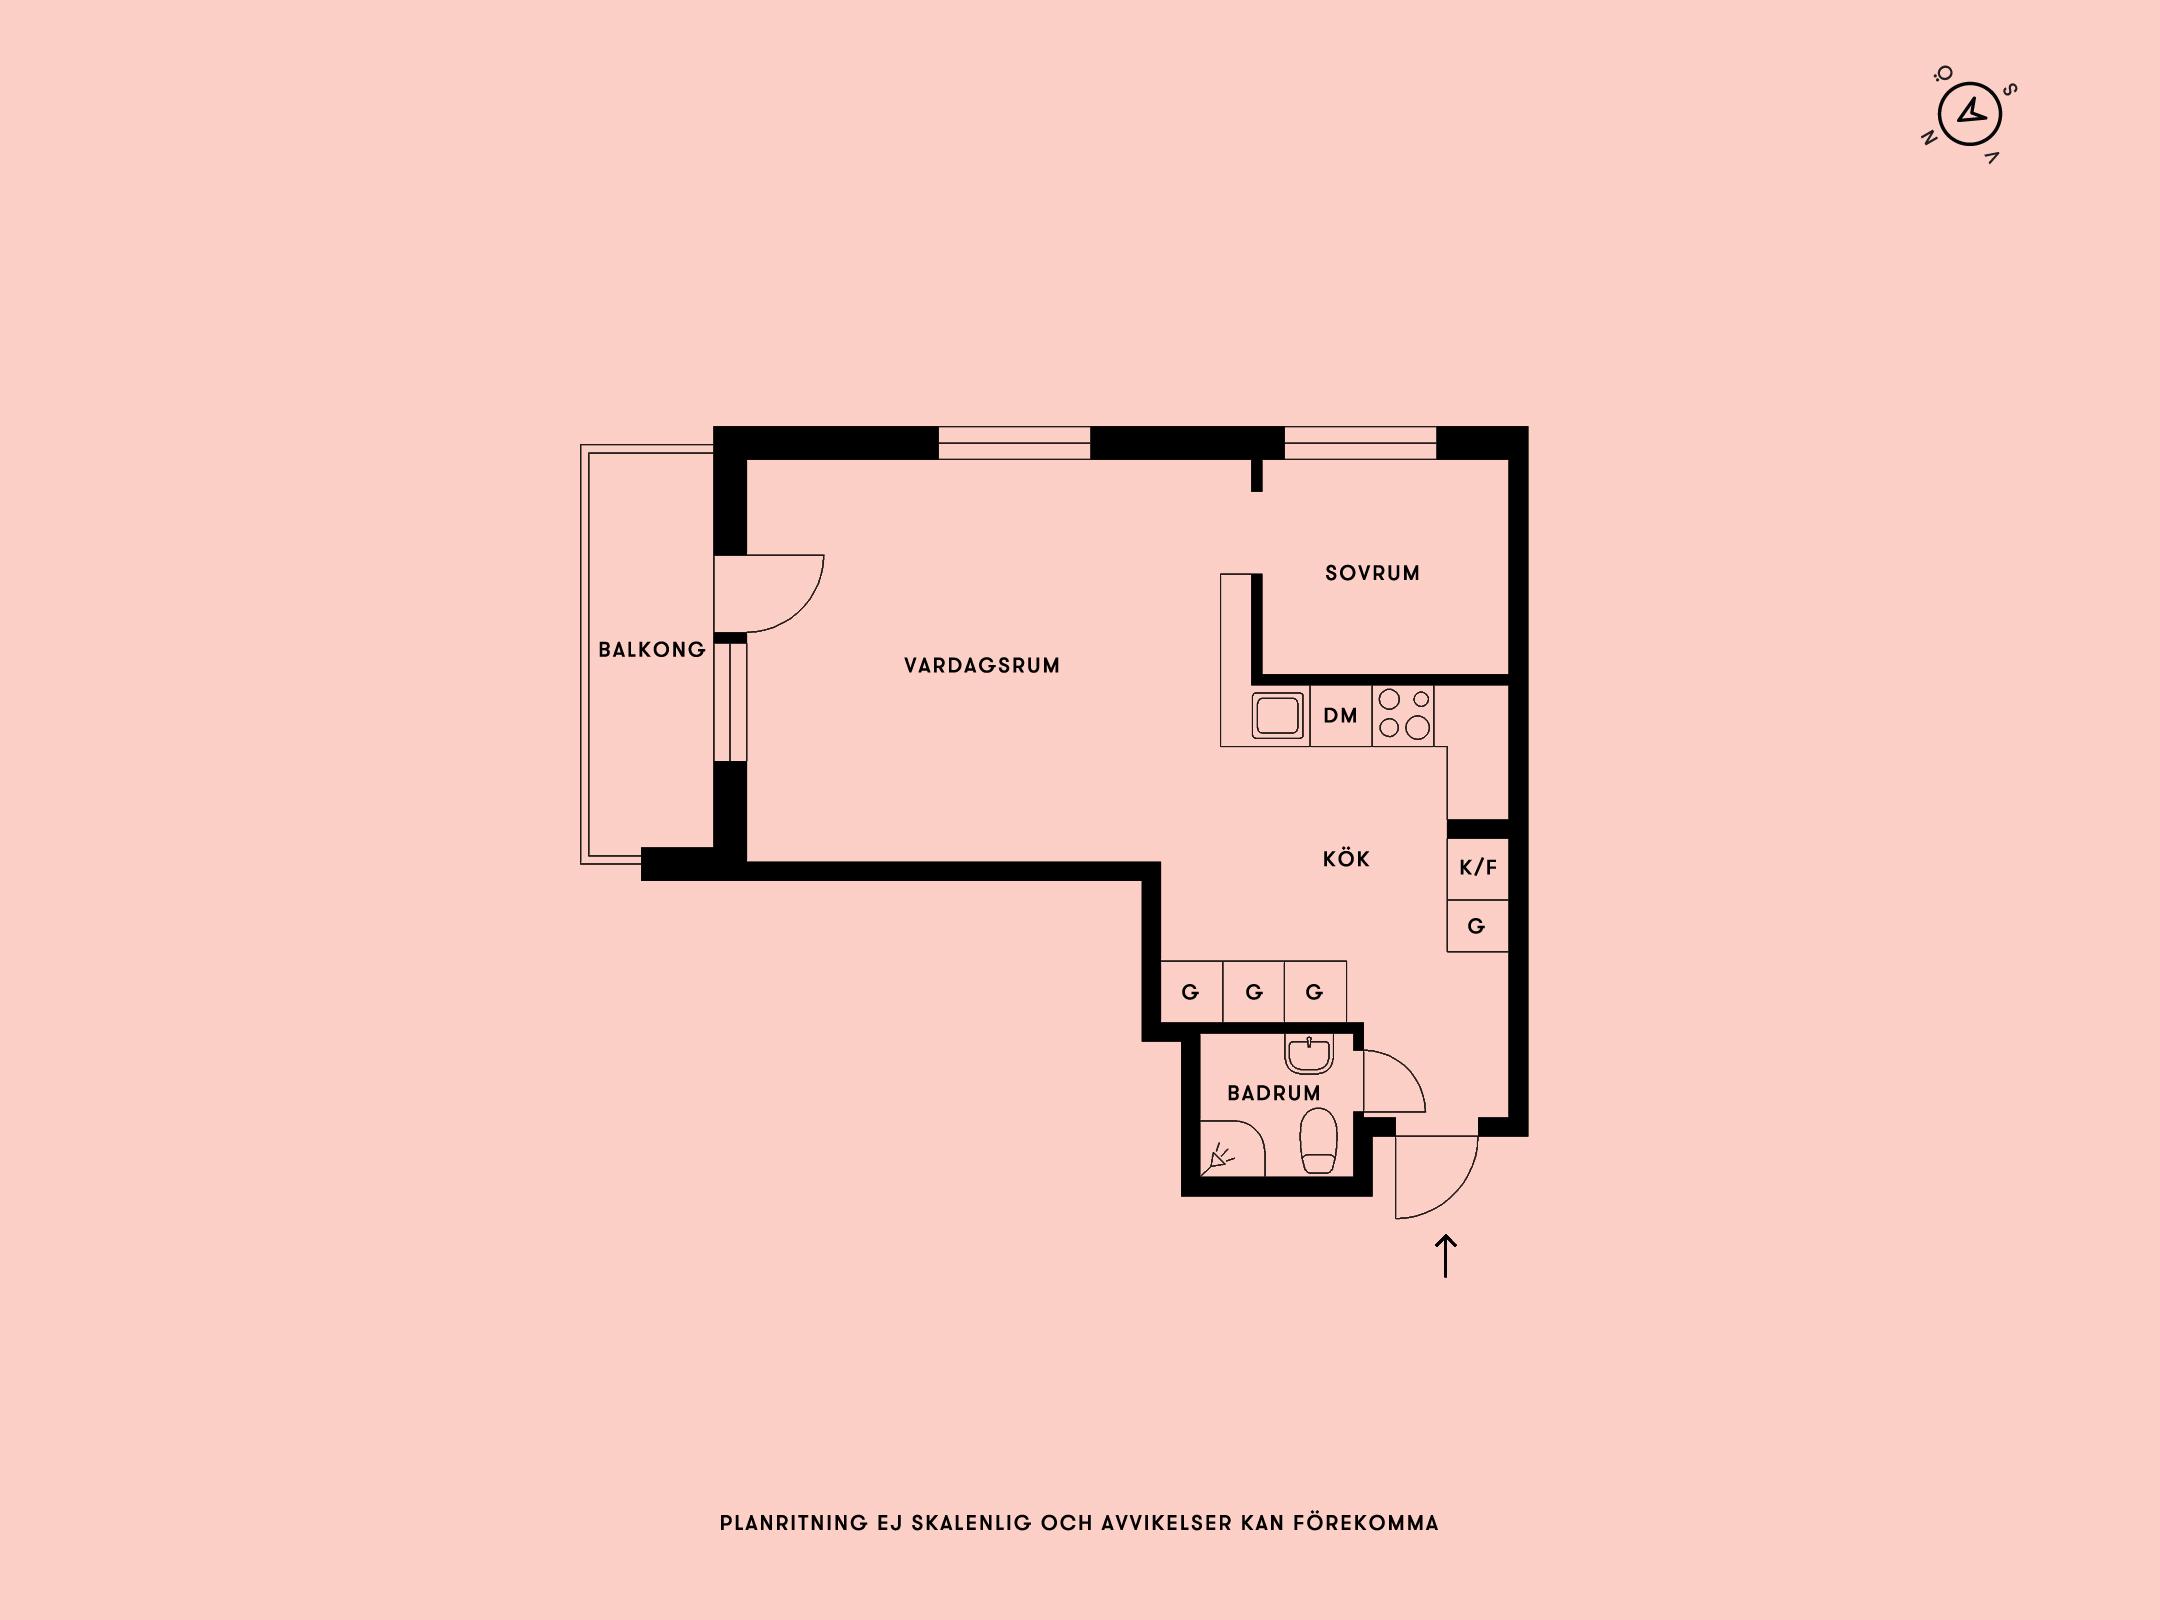 Nooks-erikdahlbergsgatan-29-planlosning